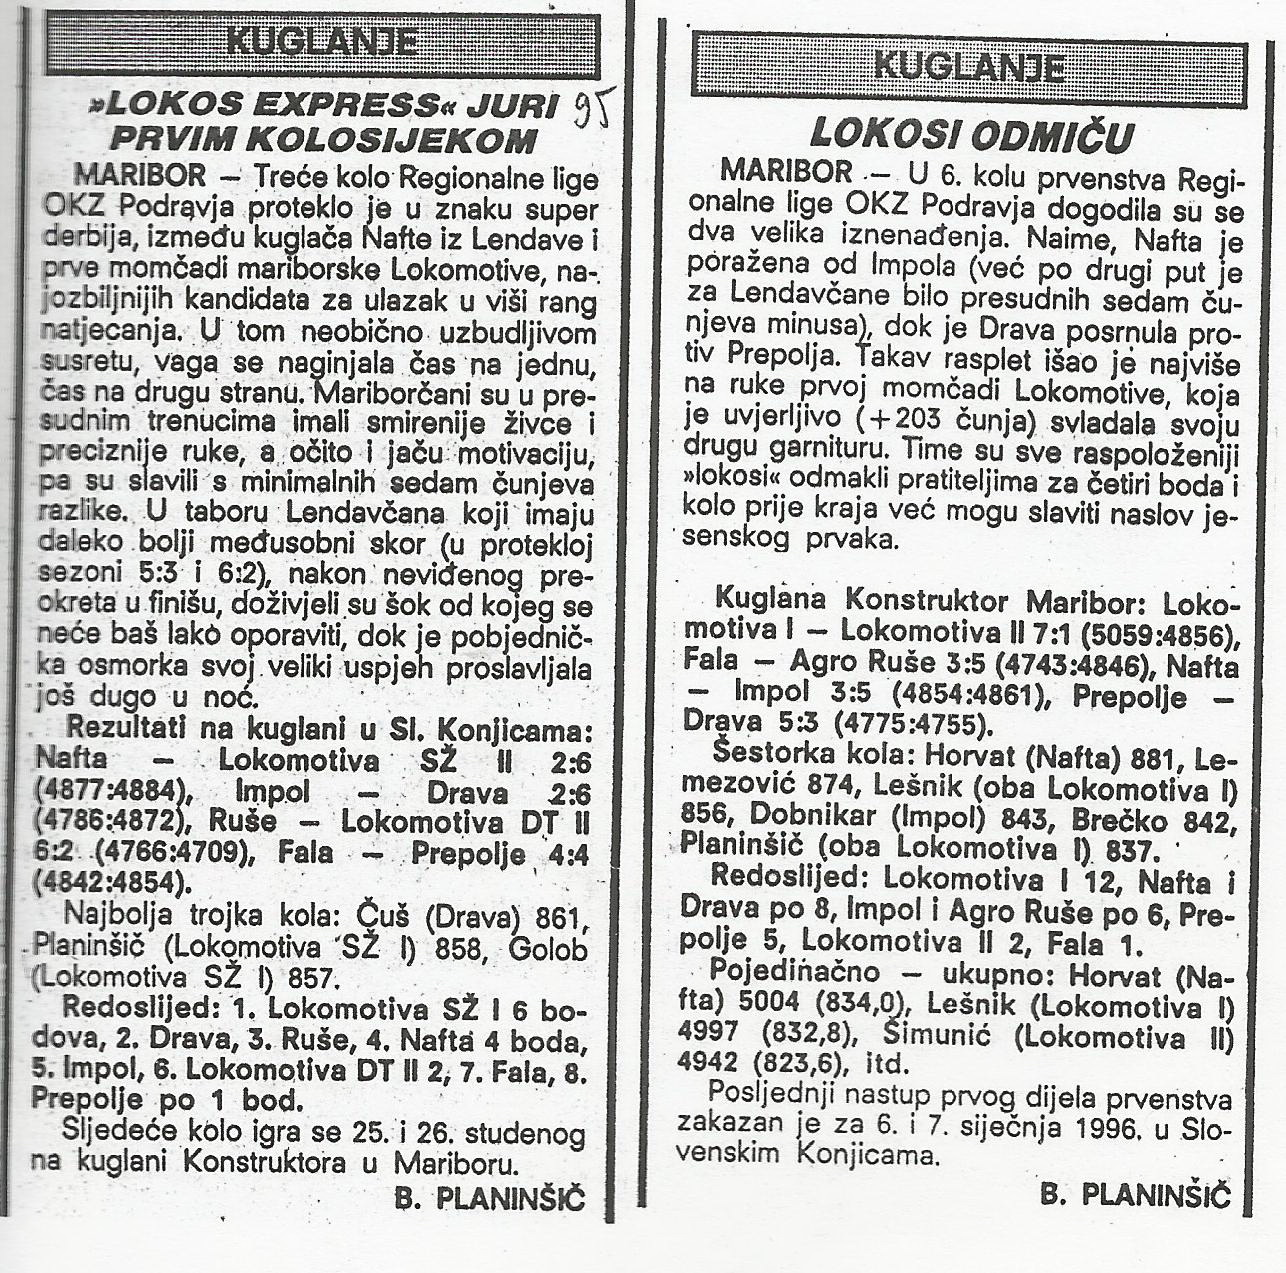 OKZ liga, Sportske Novosti, 1995